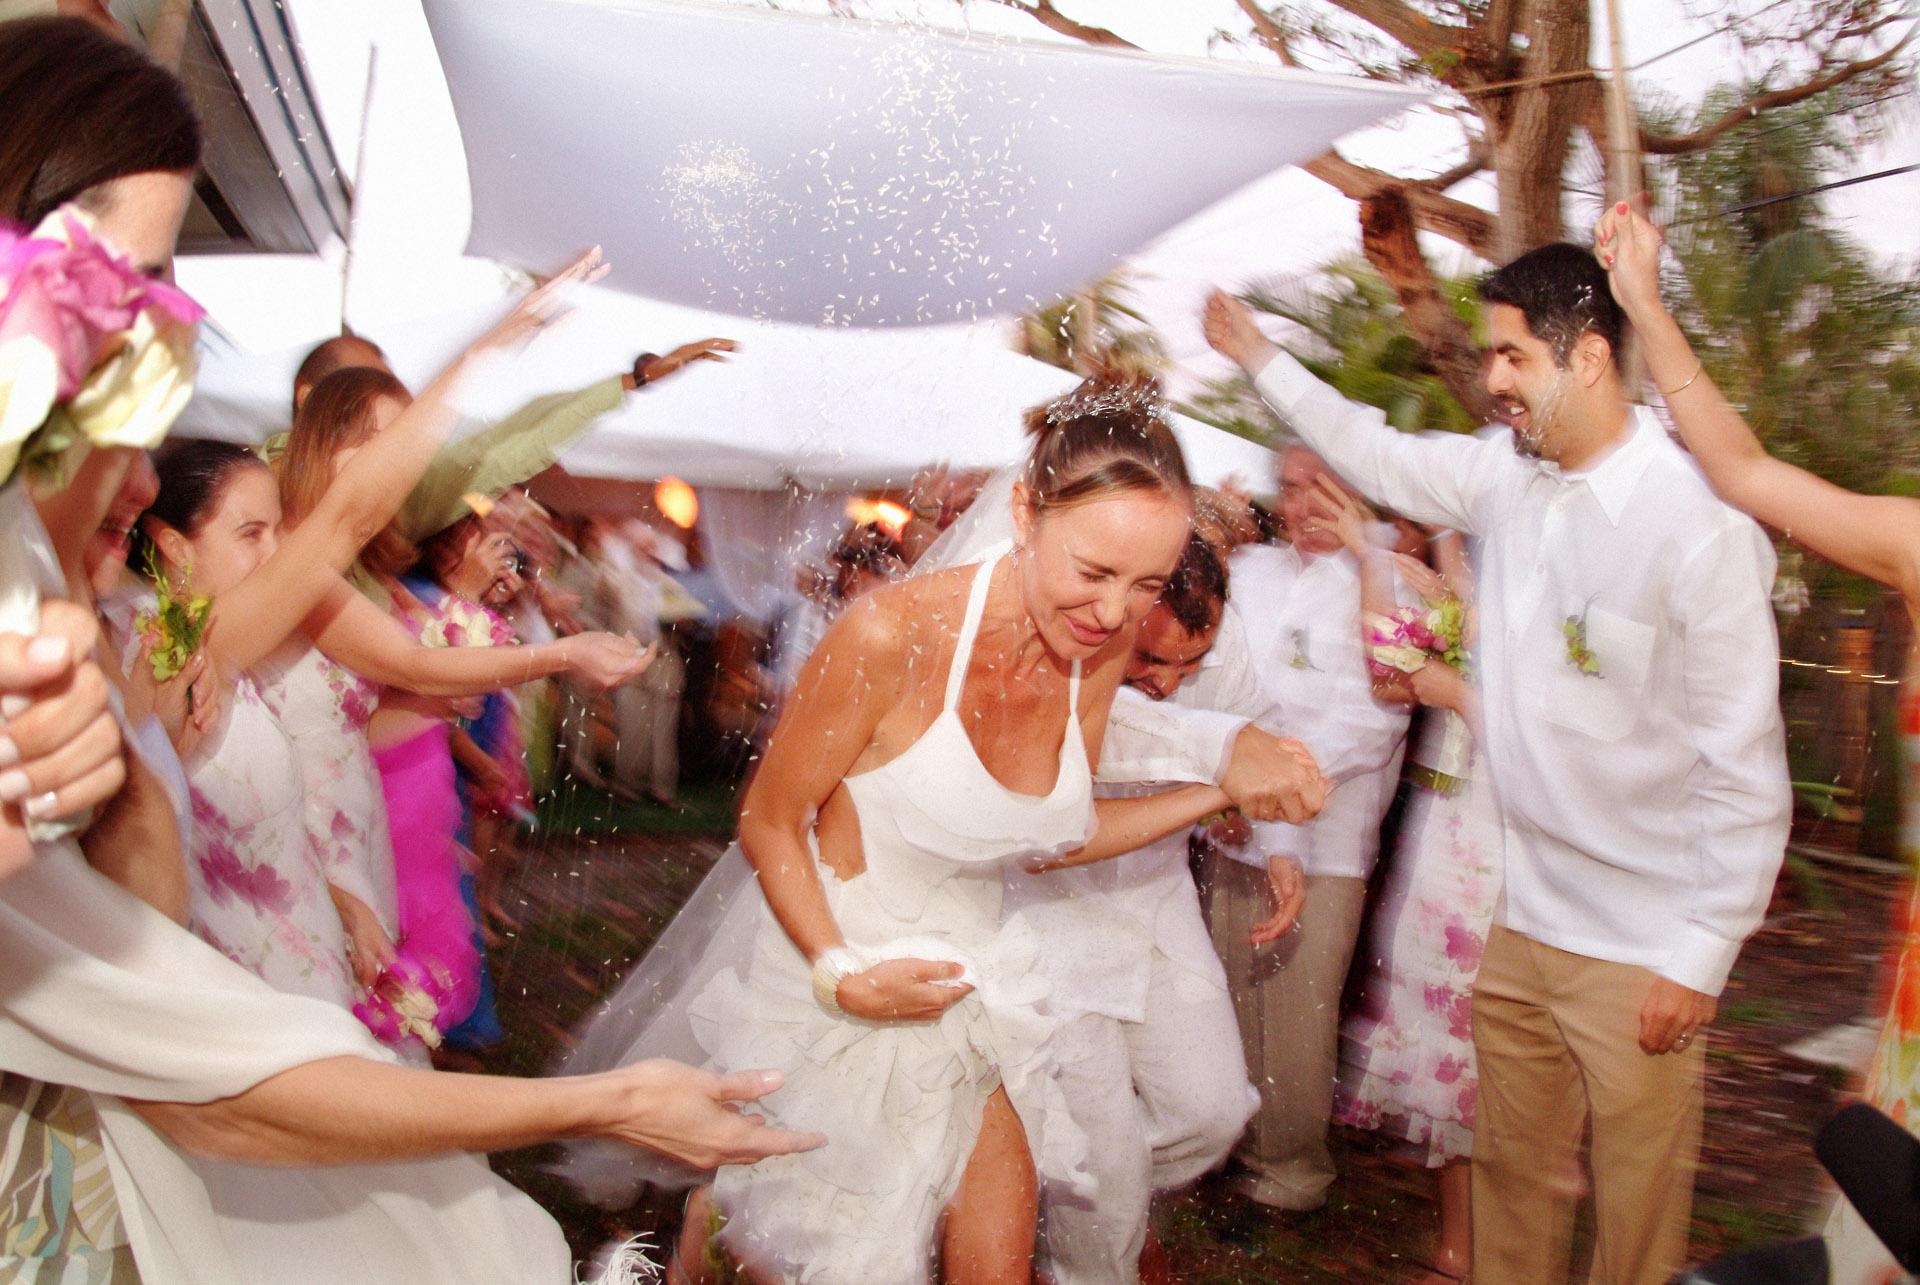 Professional wedding photography Atlanta. Destination wedding photographer: Tallahassee, Tampa, Orlando, Naples, Miami, Key West. I Shot The Bride®